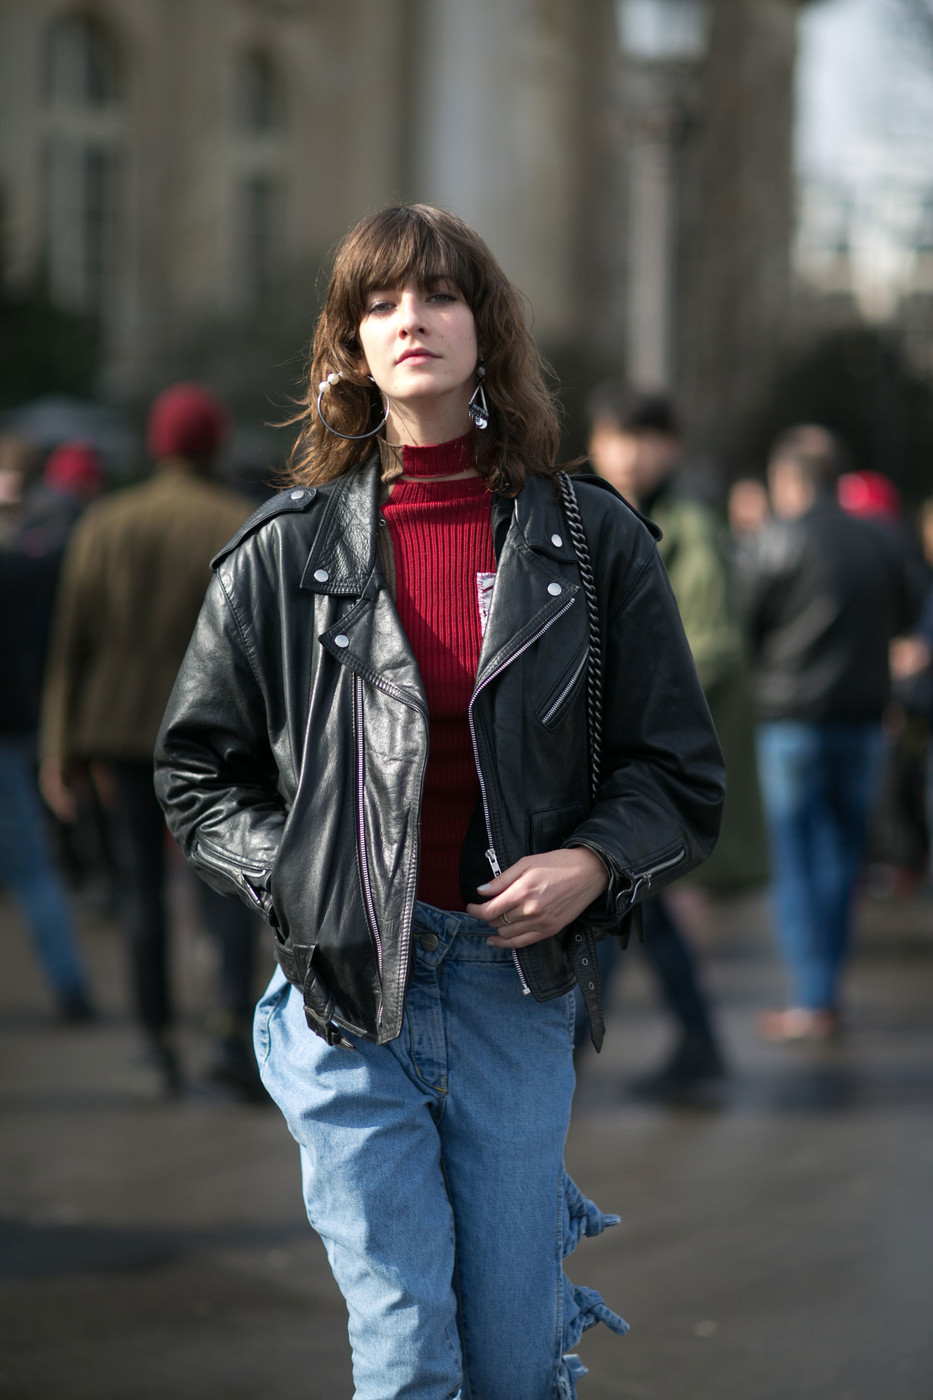 Street Style: Cristina Herrmann's '90s Biker Look